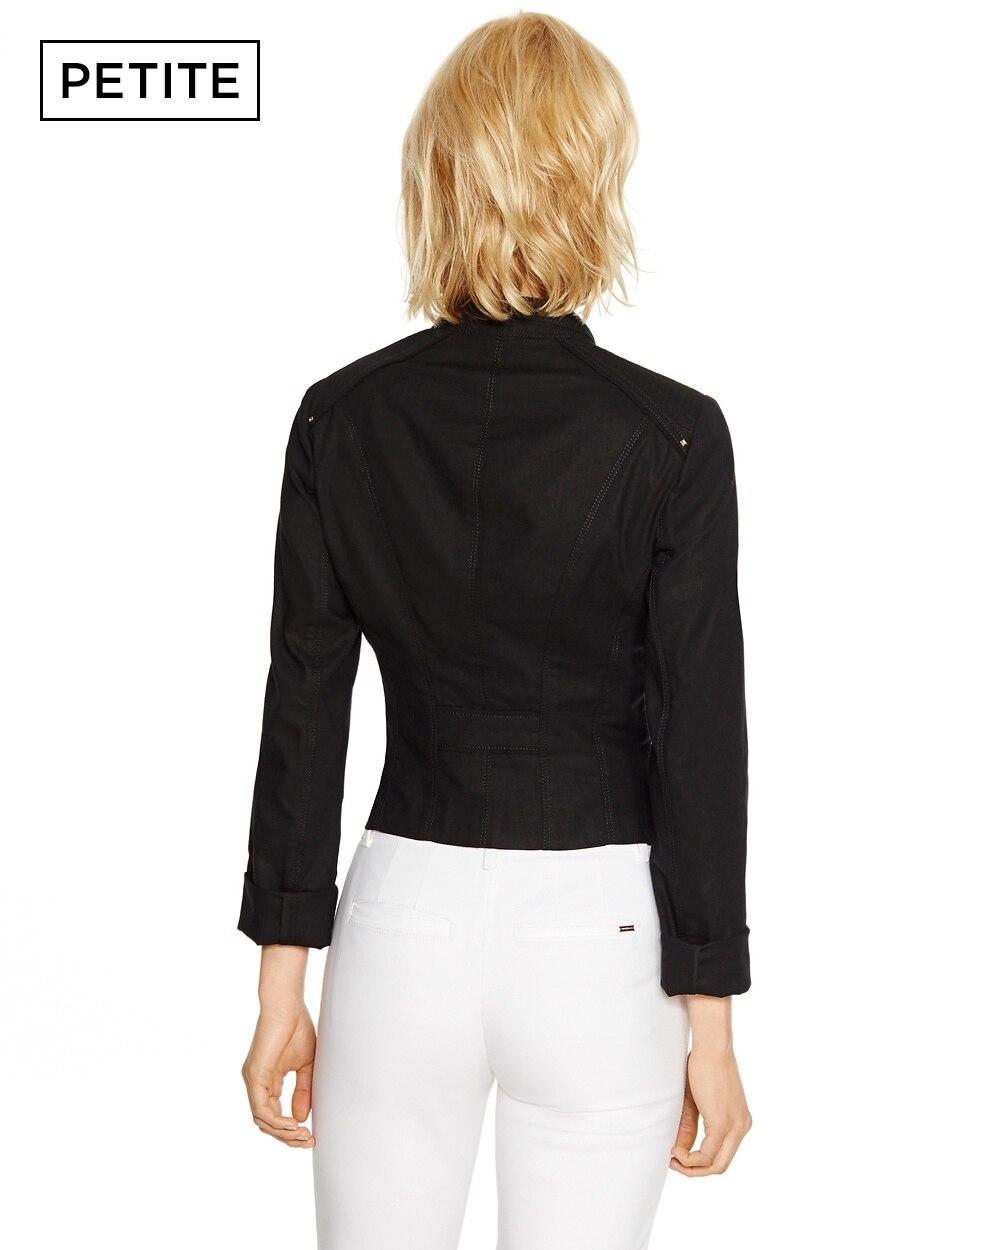 Petite Long Sleeve Linen Black Motorcycle Jacket - White . a06edbb90